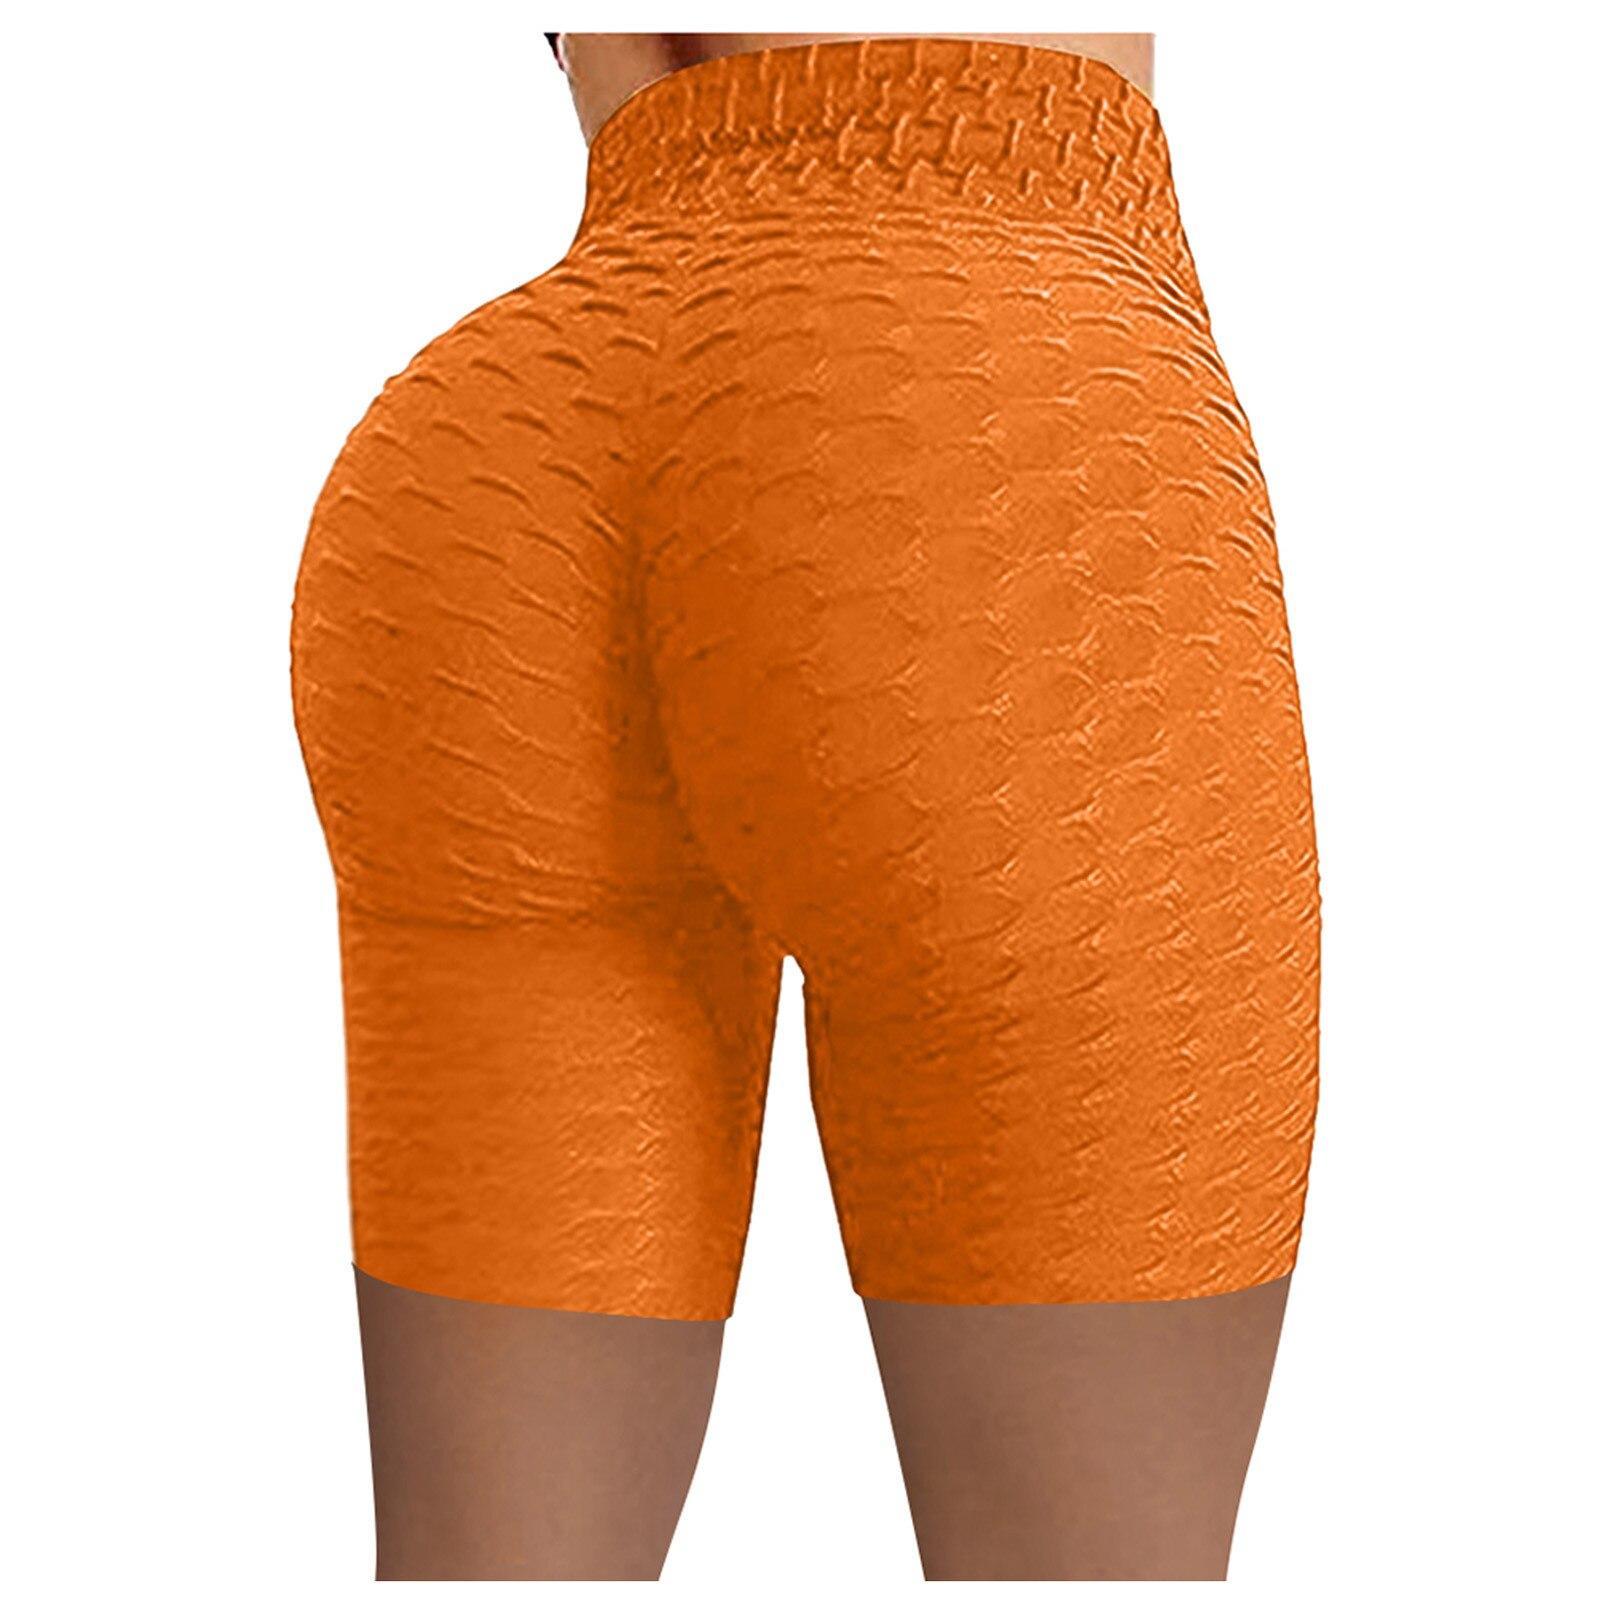 Push Up Leggings Exercises Women Slimming Shorts